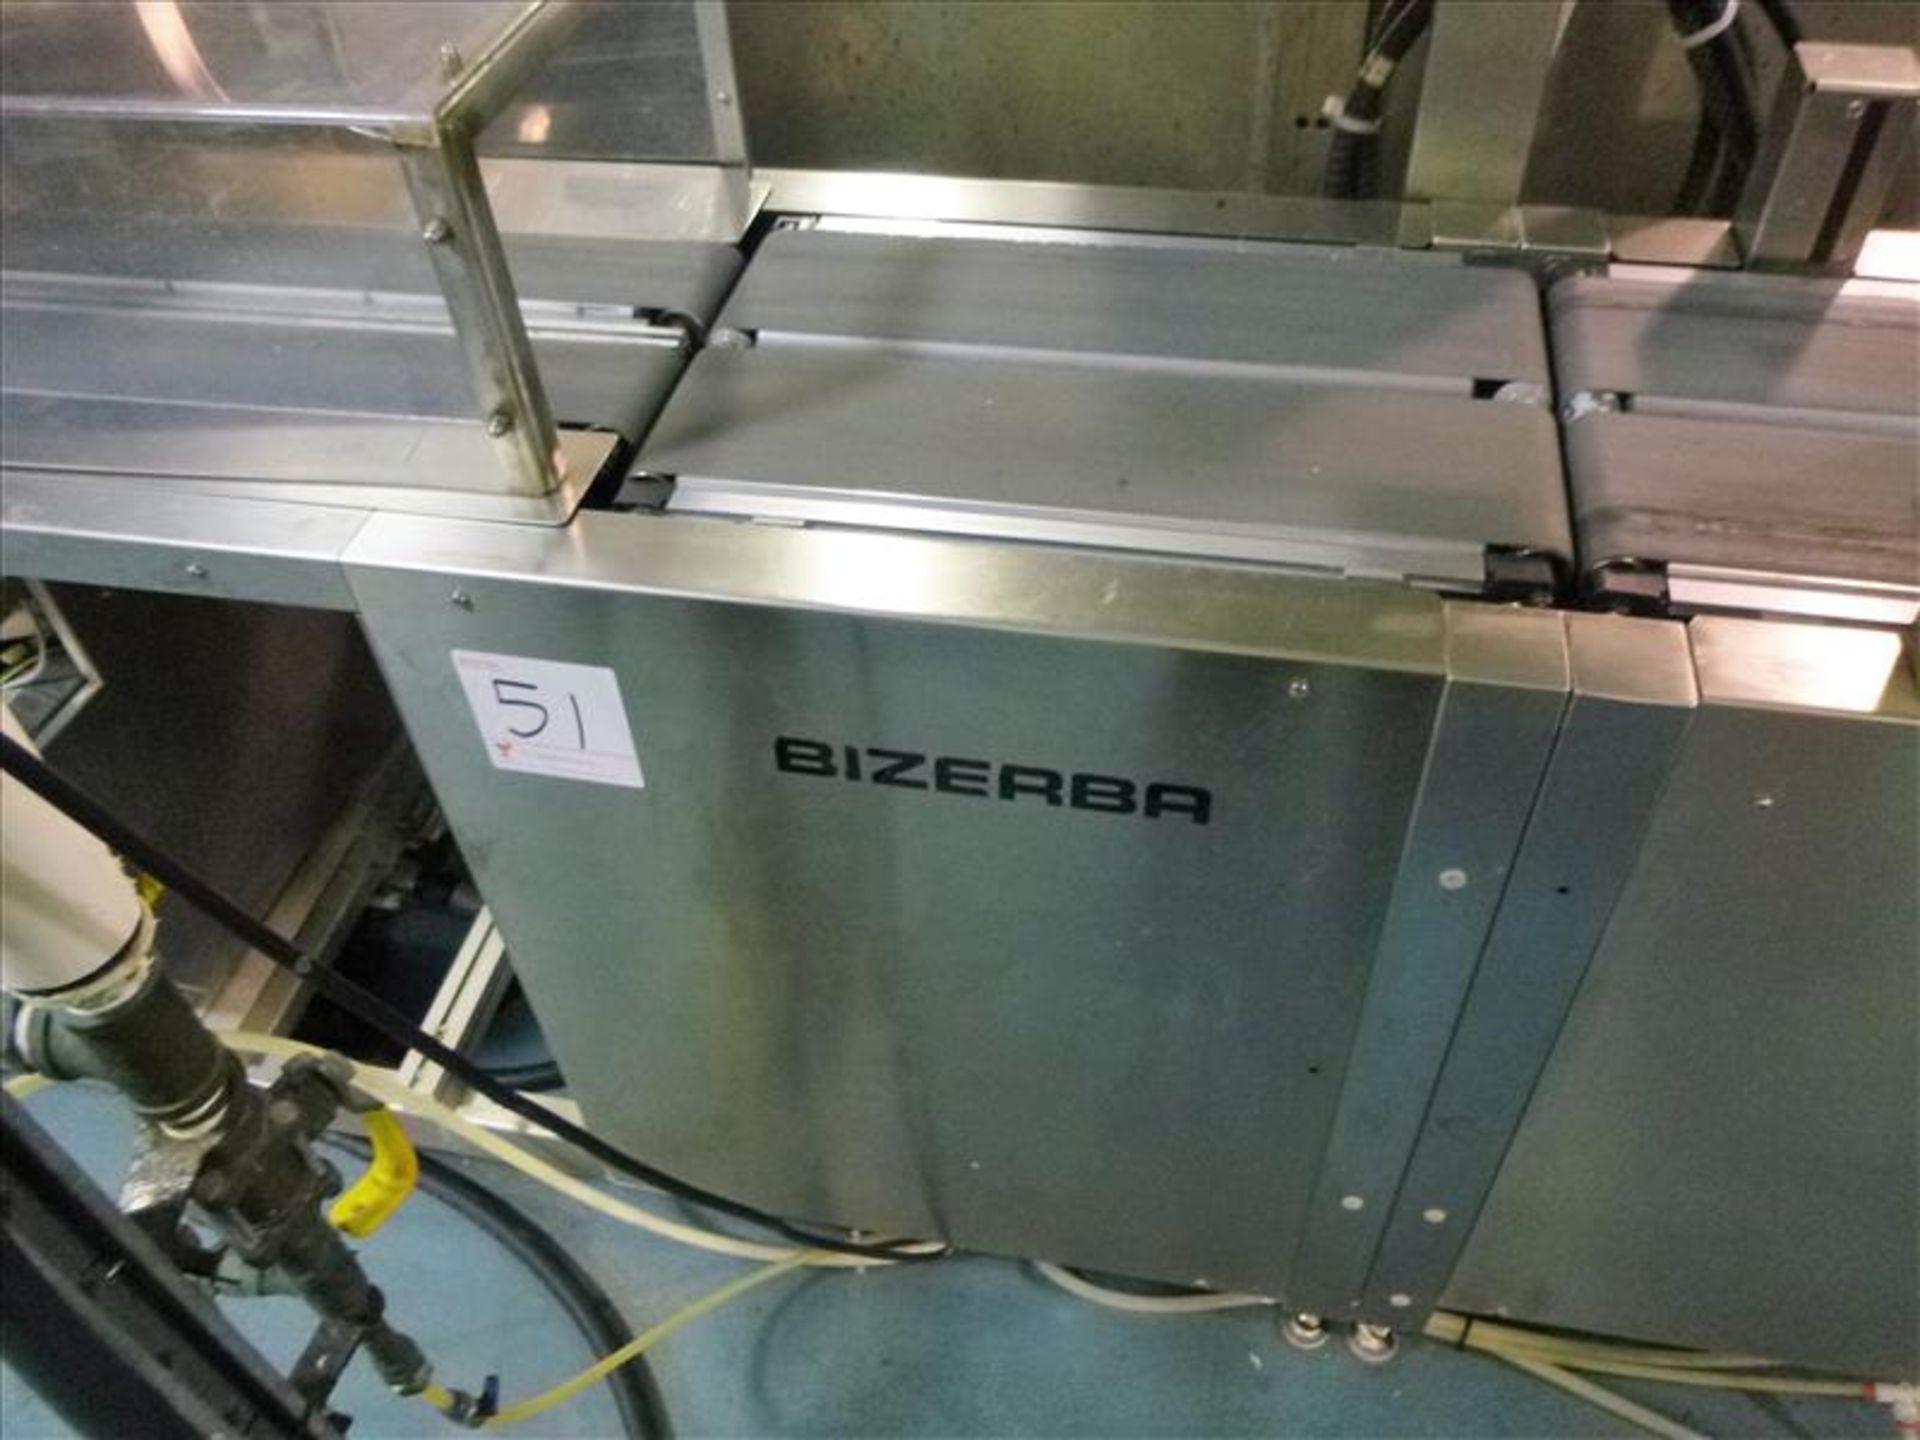 Lot 51 - Bizerba in-line check-weigher system (SLAVE1) w/ Bizerba GS label printer and Bizerba AB controller,